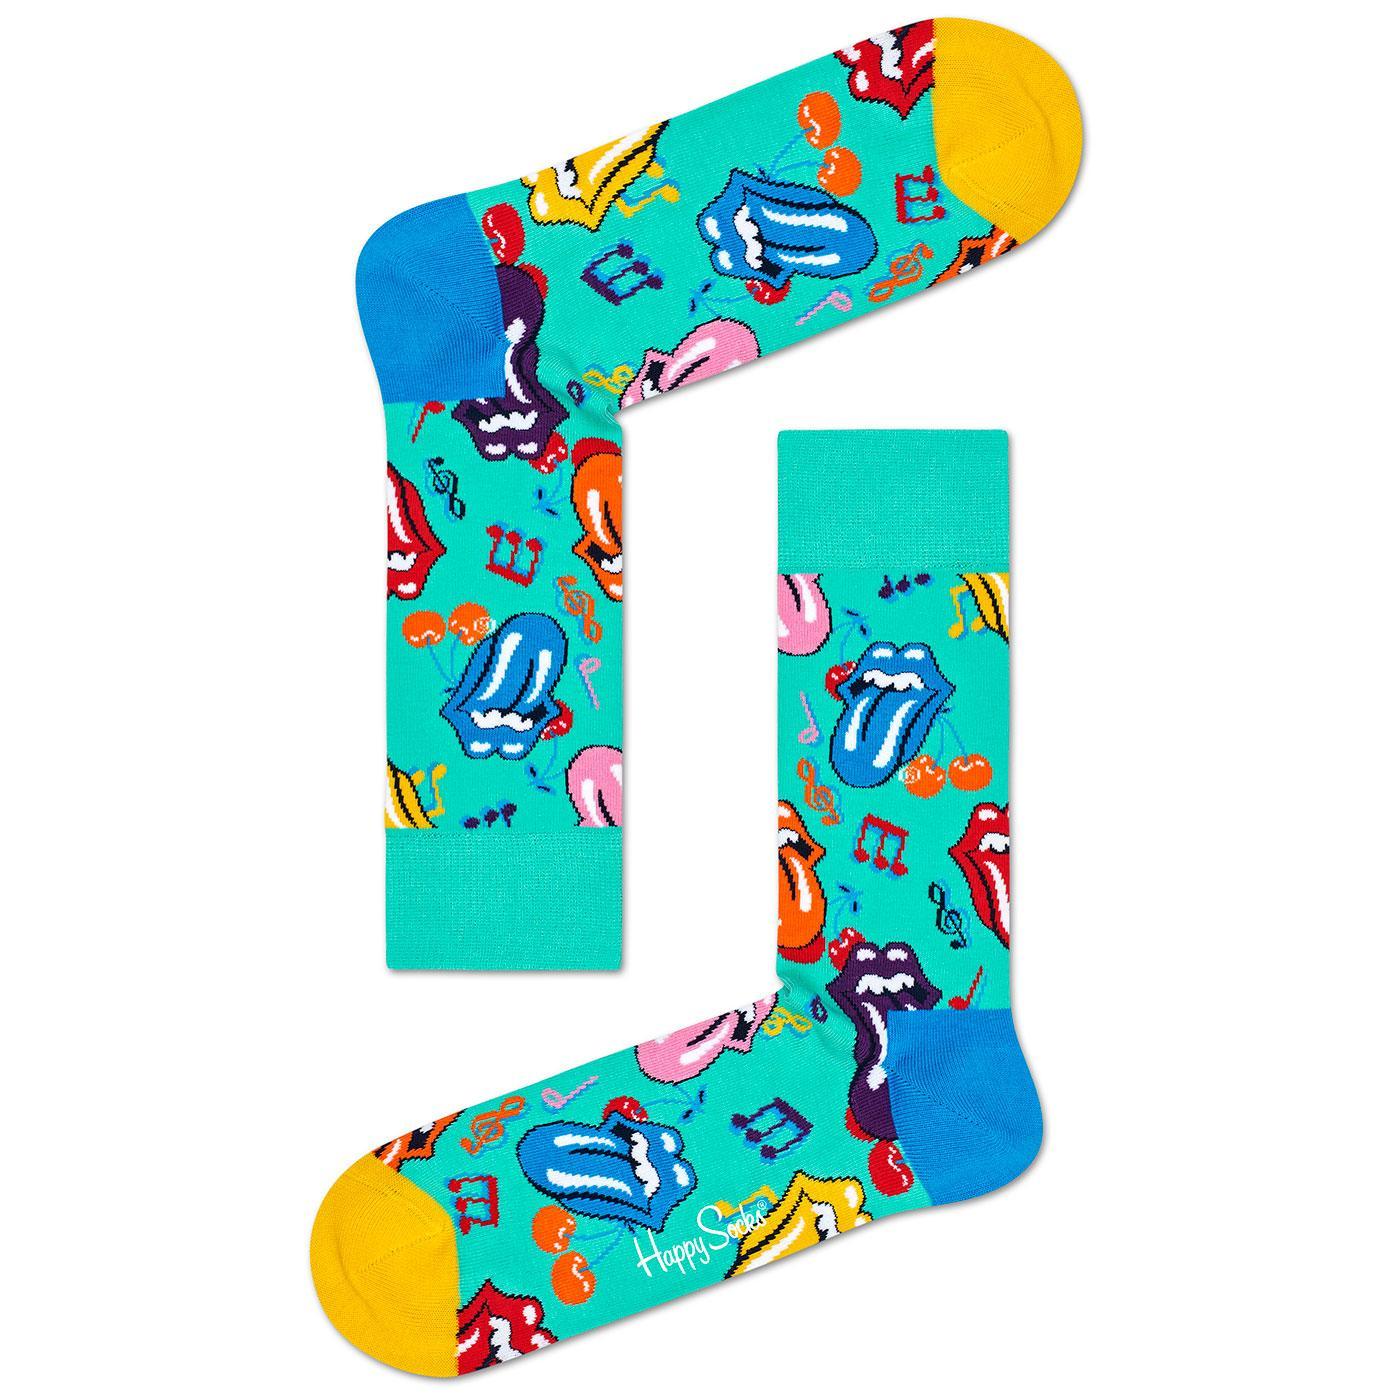 + HAPPY SOCKS x ROLLING STONES Shattered Socks